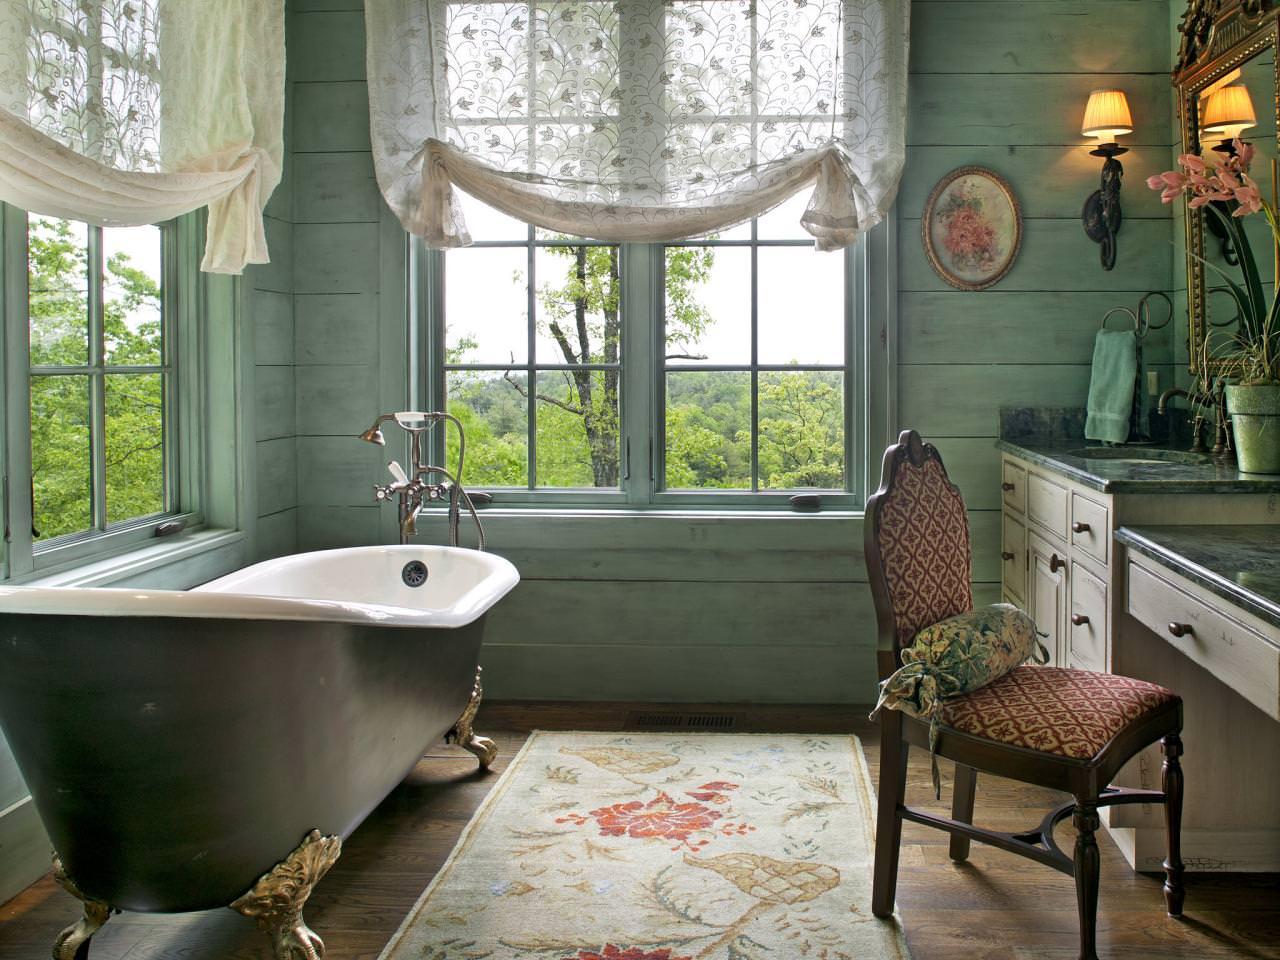 ретро дизайн комнаты картинки яркое значимое событие